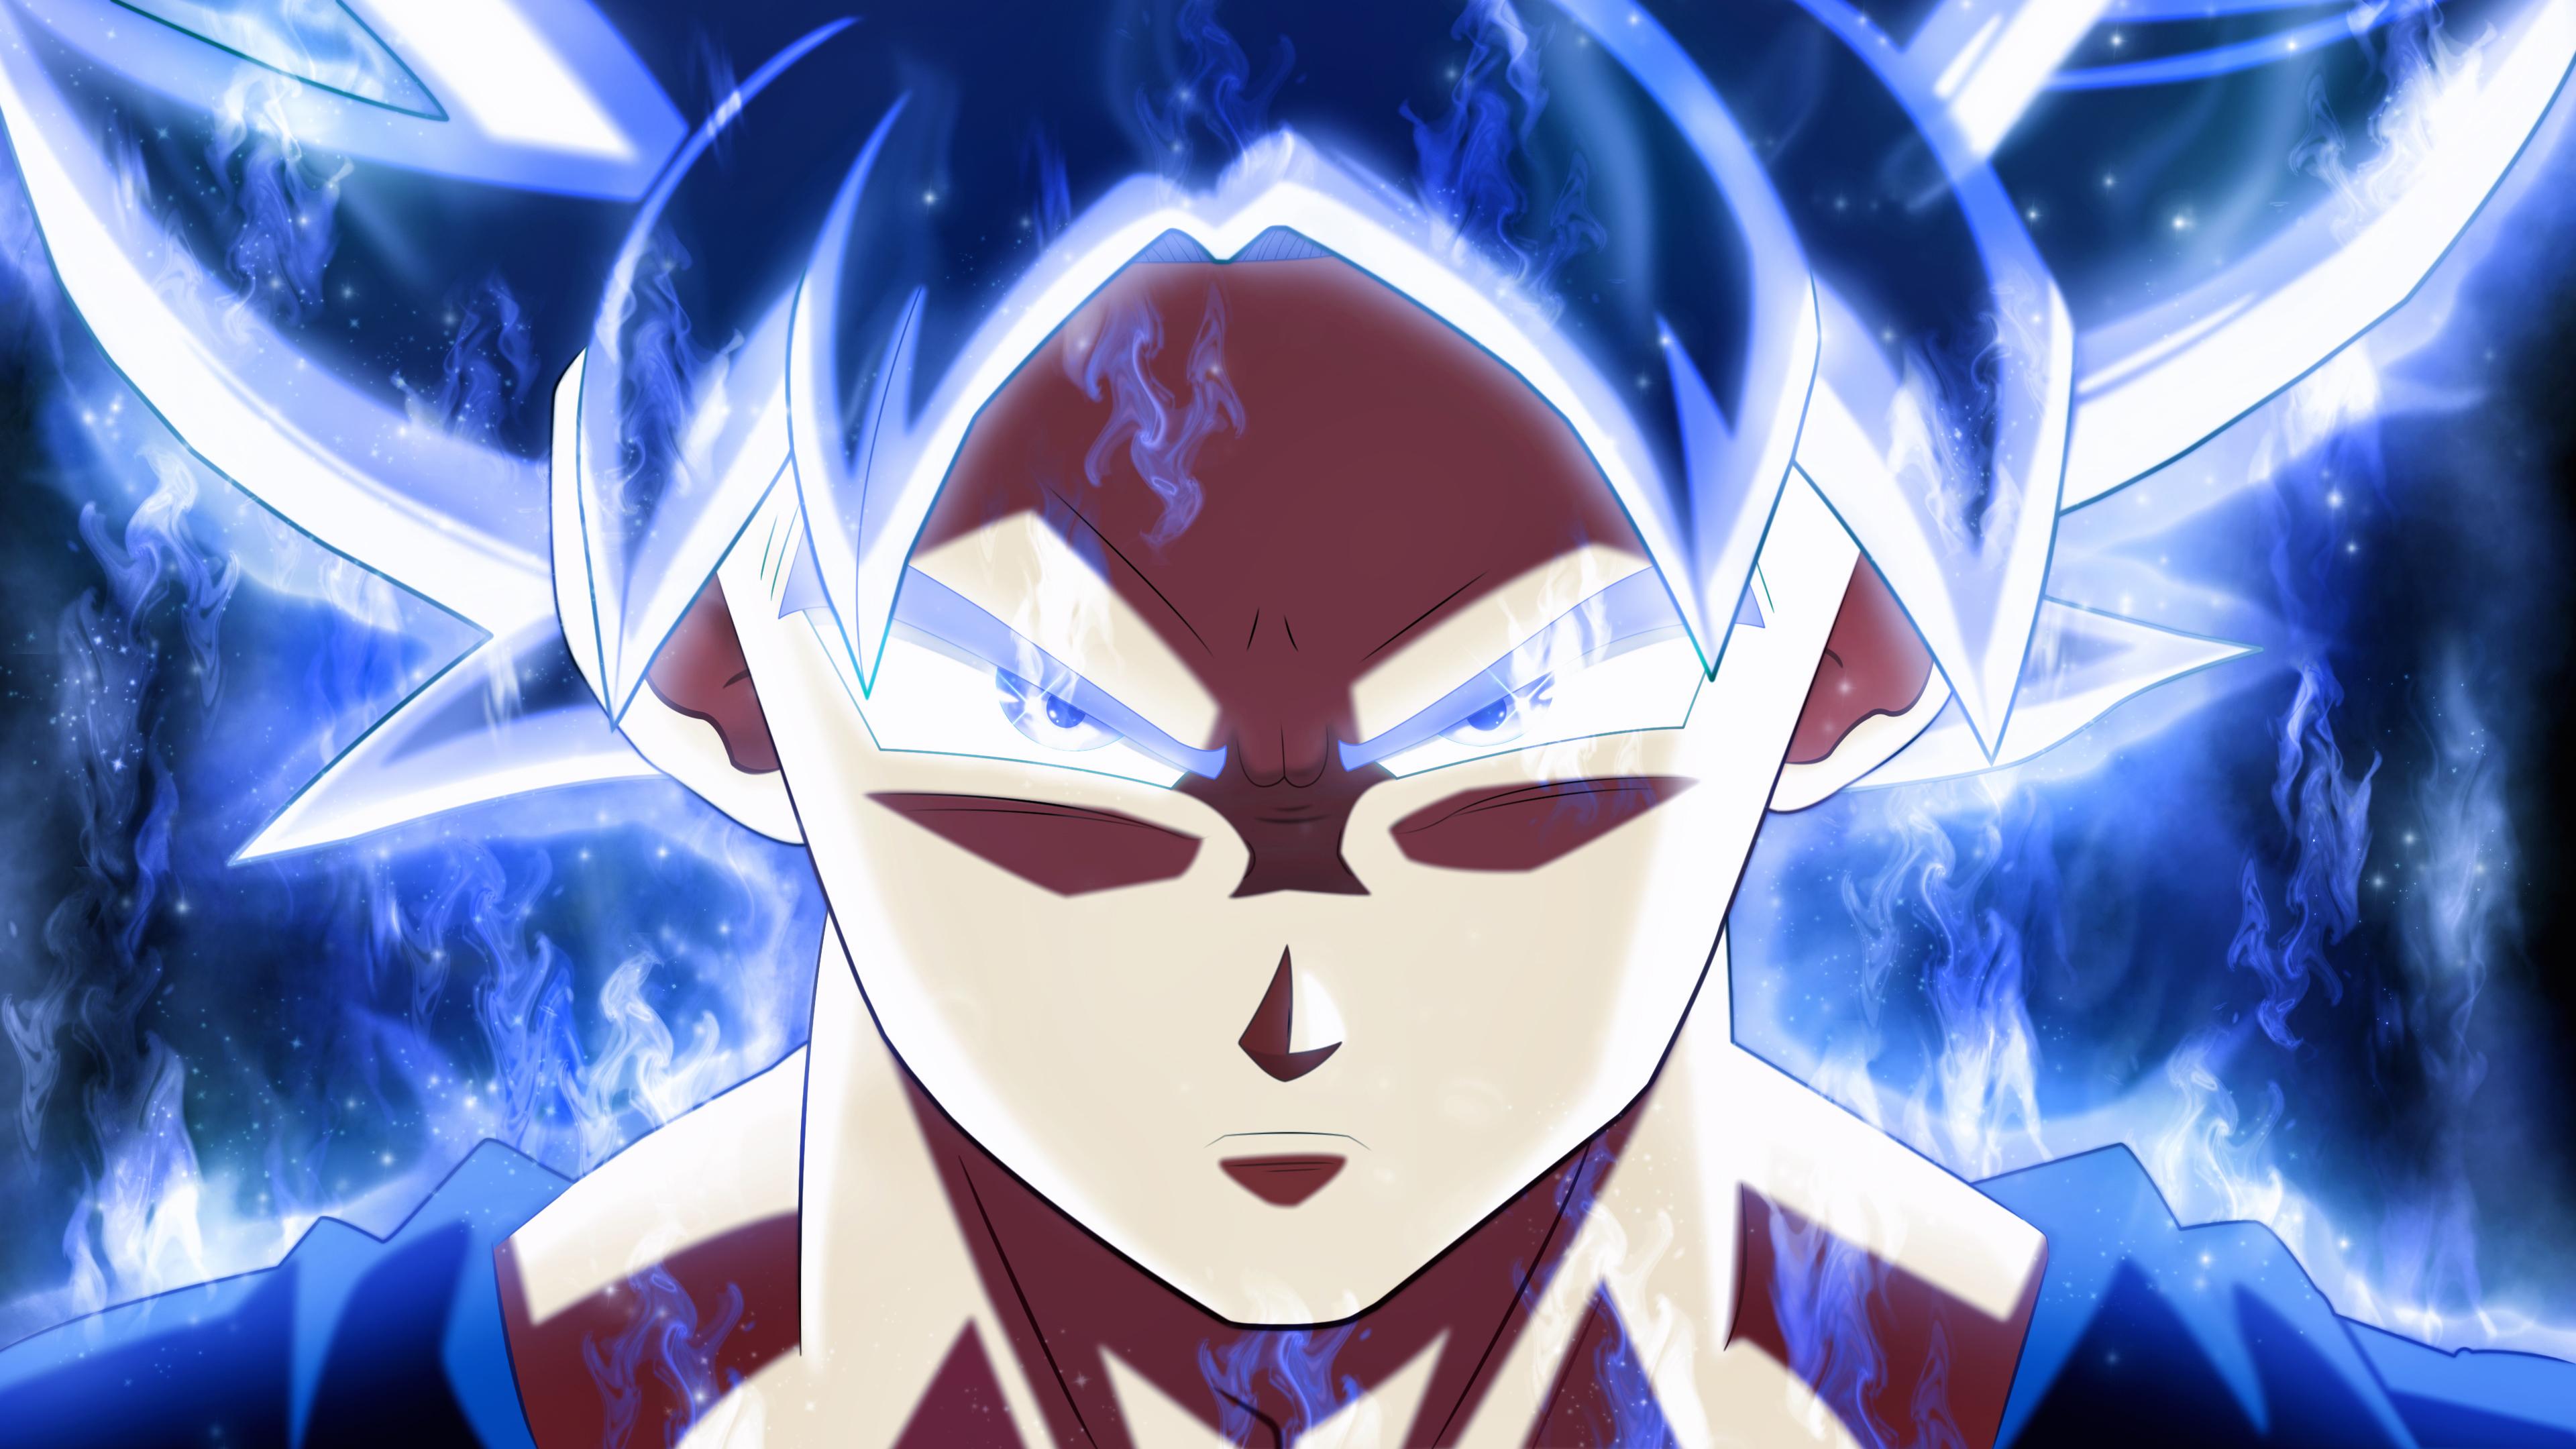 1440x900 Son Goku Dragon Ball Super 4k 1440x900 Resolution